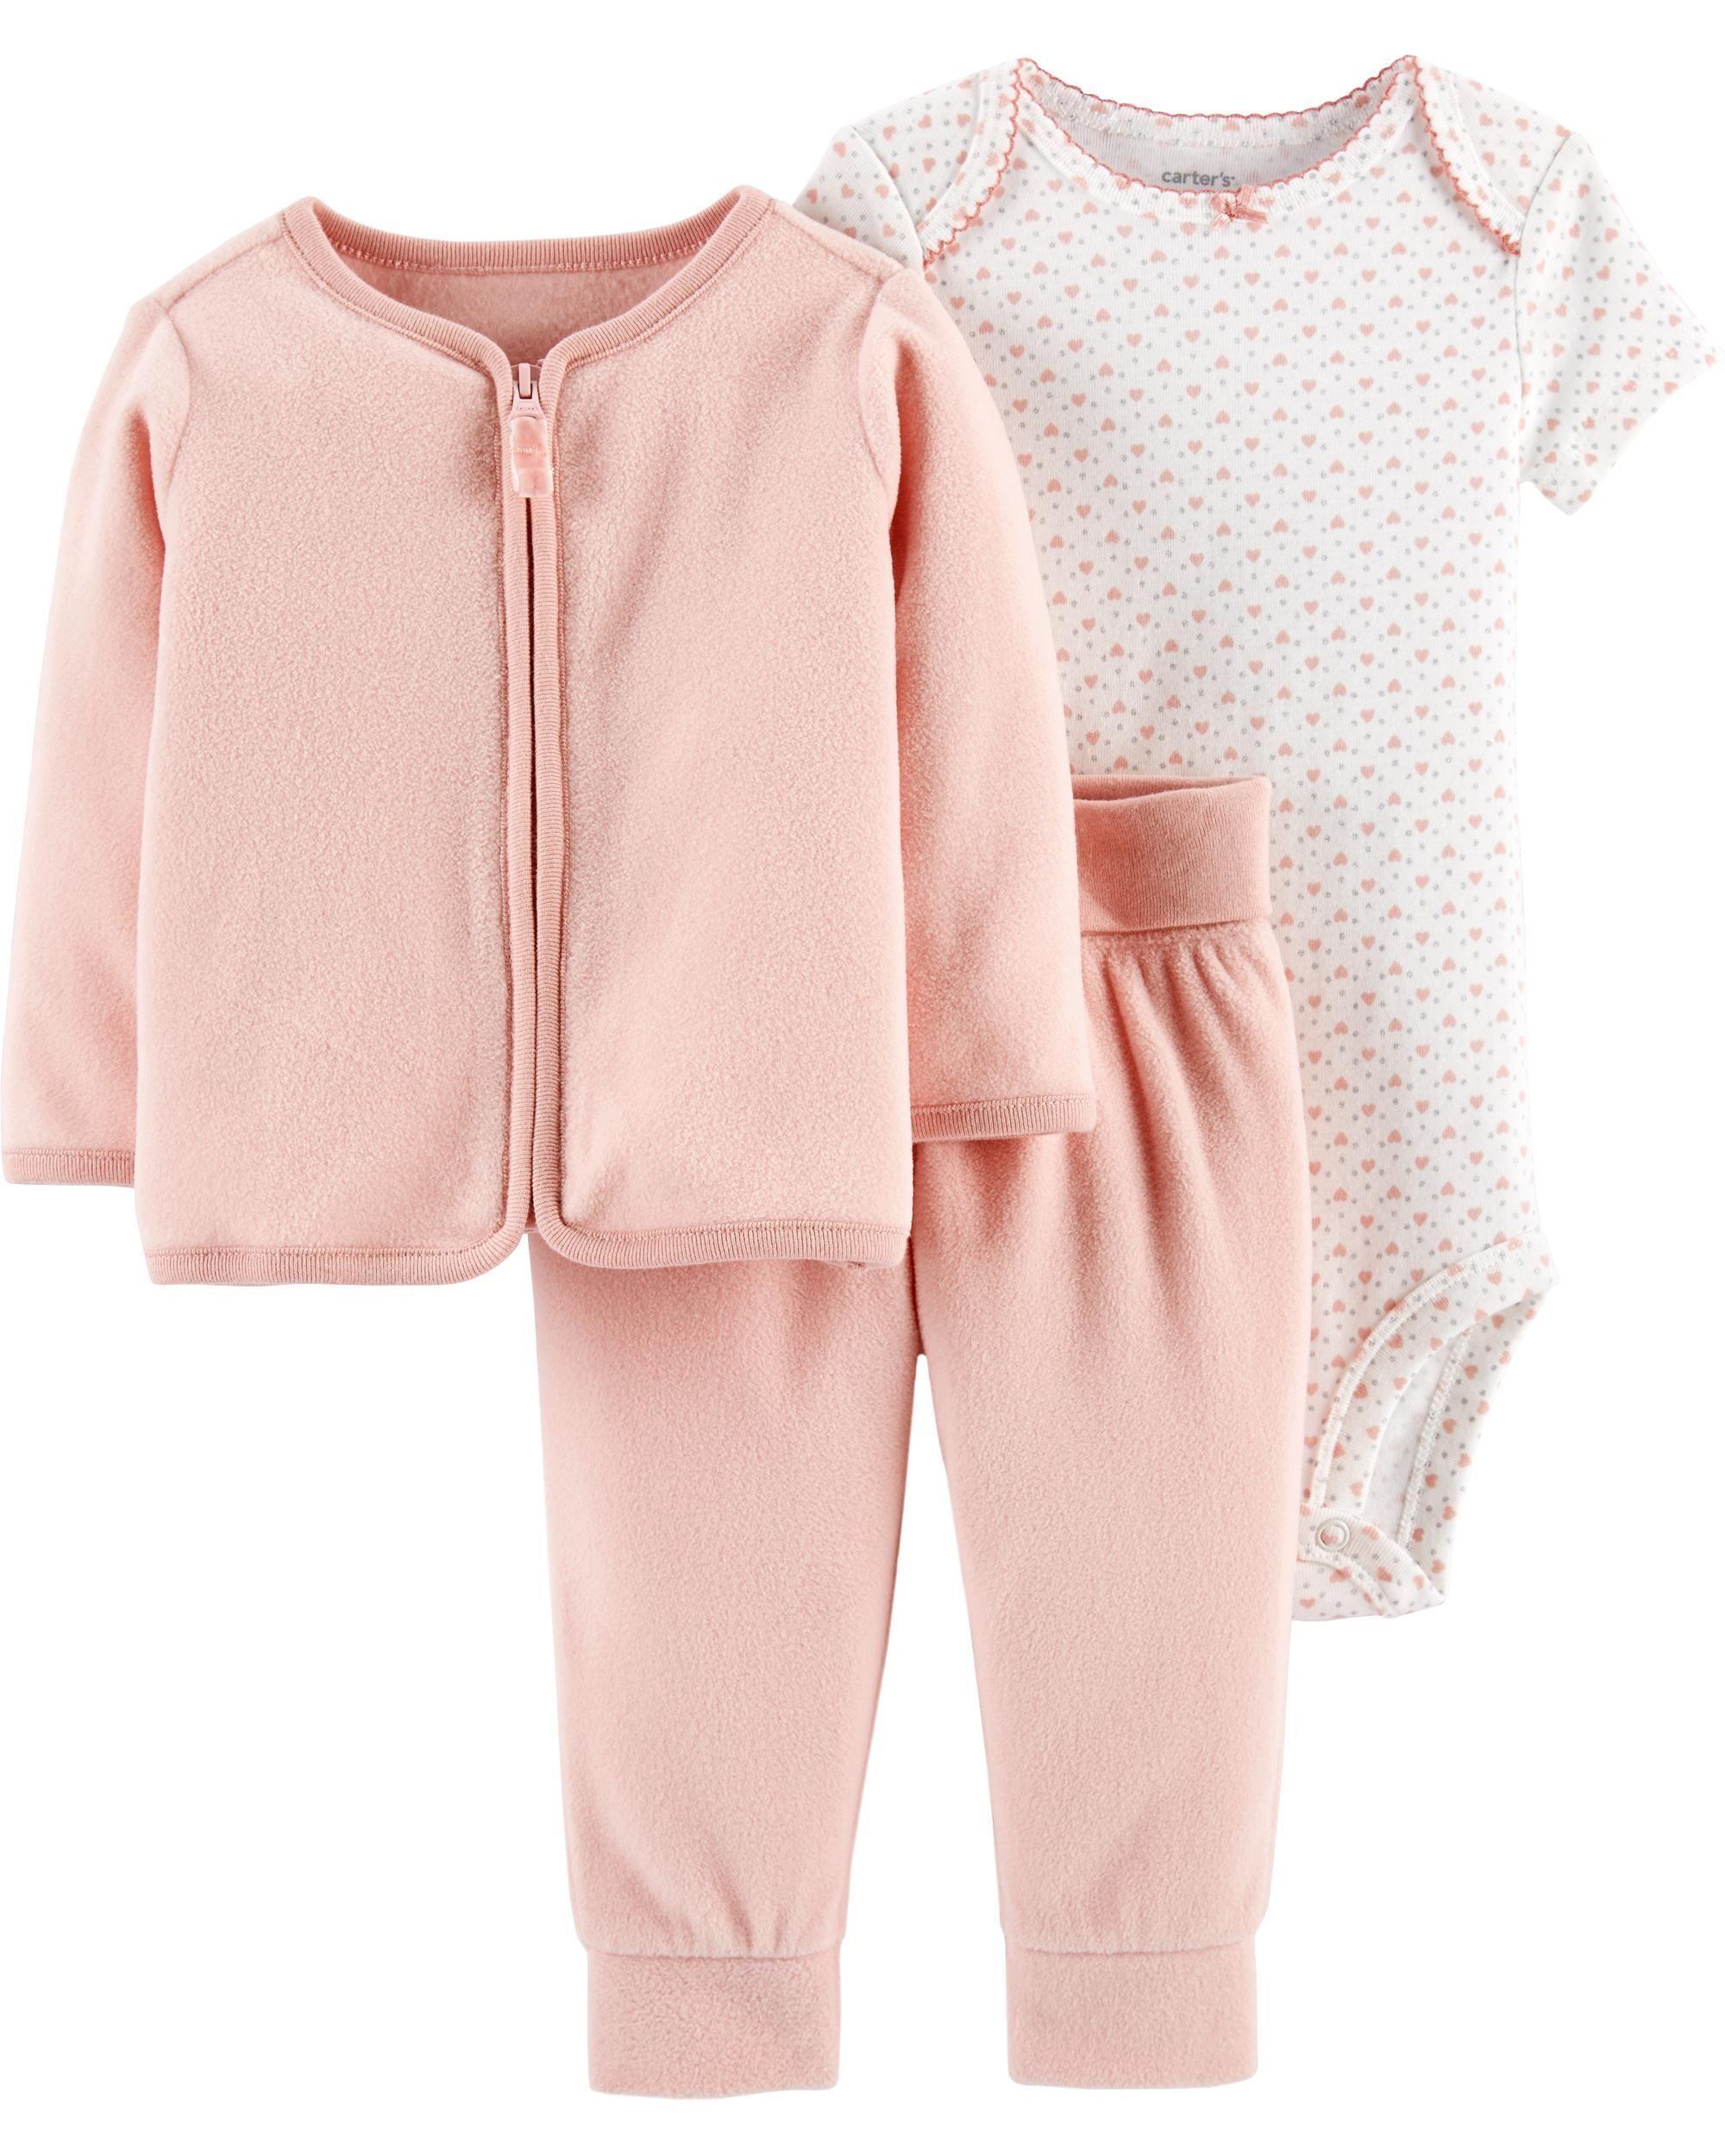 9084675e3 3-Piece Little Jacket Set | Future Baby 2 Girl: Clothes | Carters ...